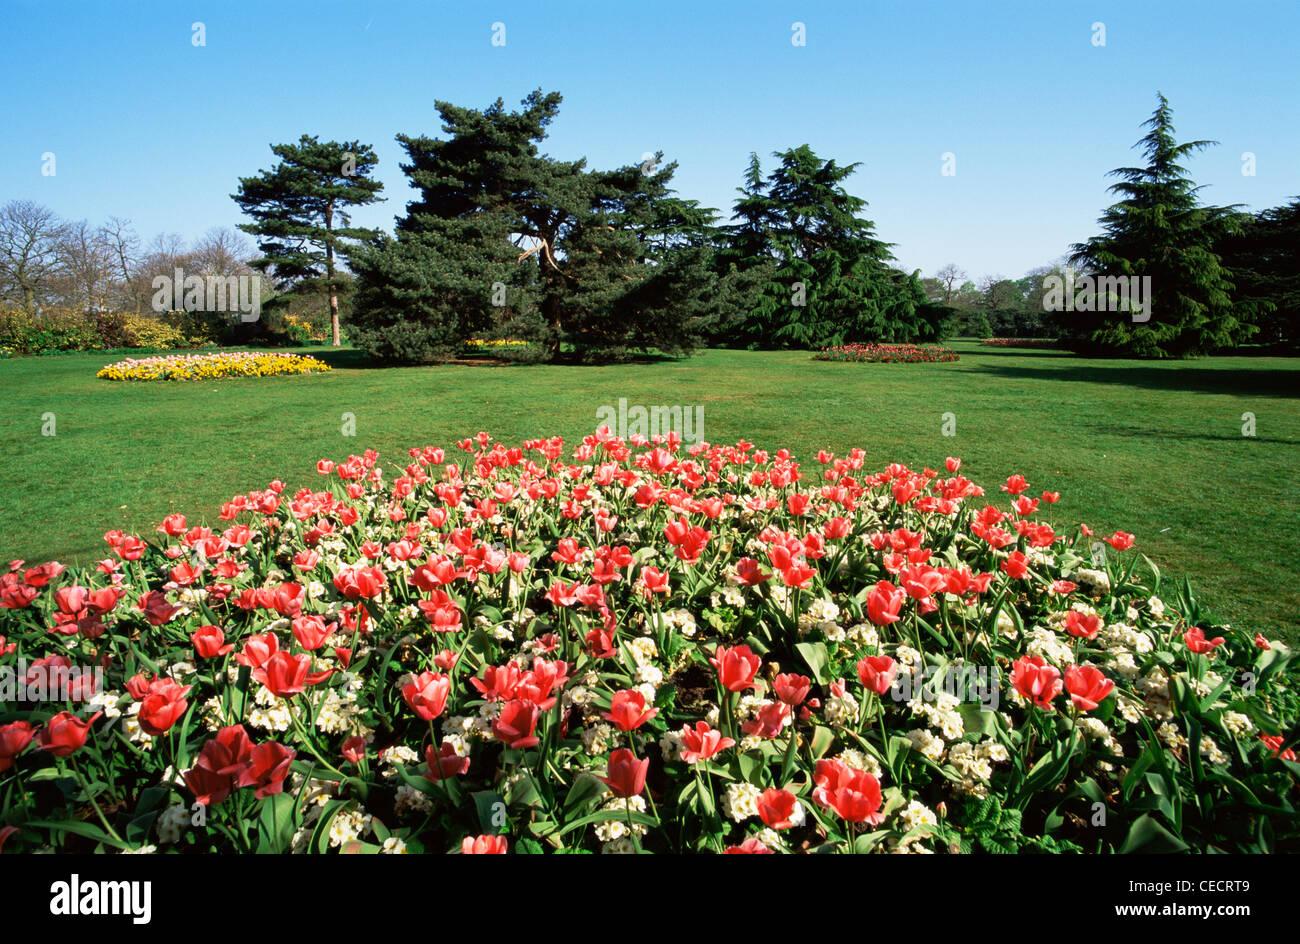 England london greenwich park spring flowers stock photo england london greenwich park spring flowers mightylinksfo